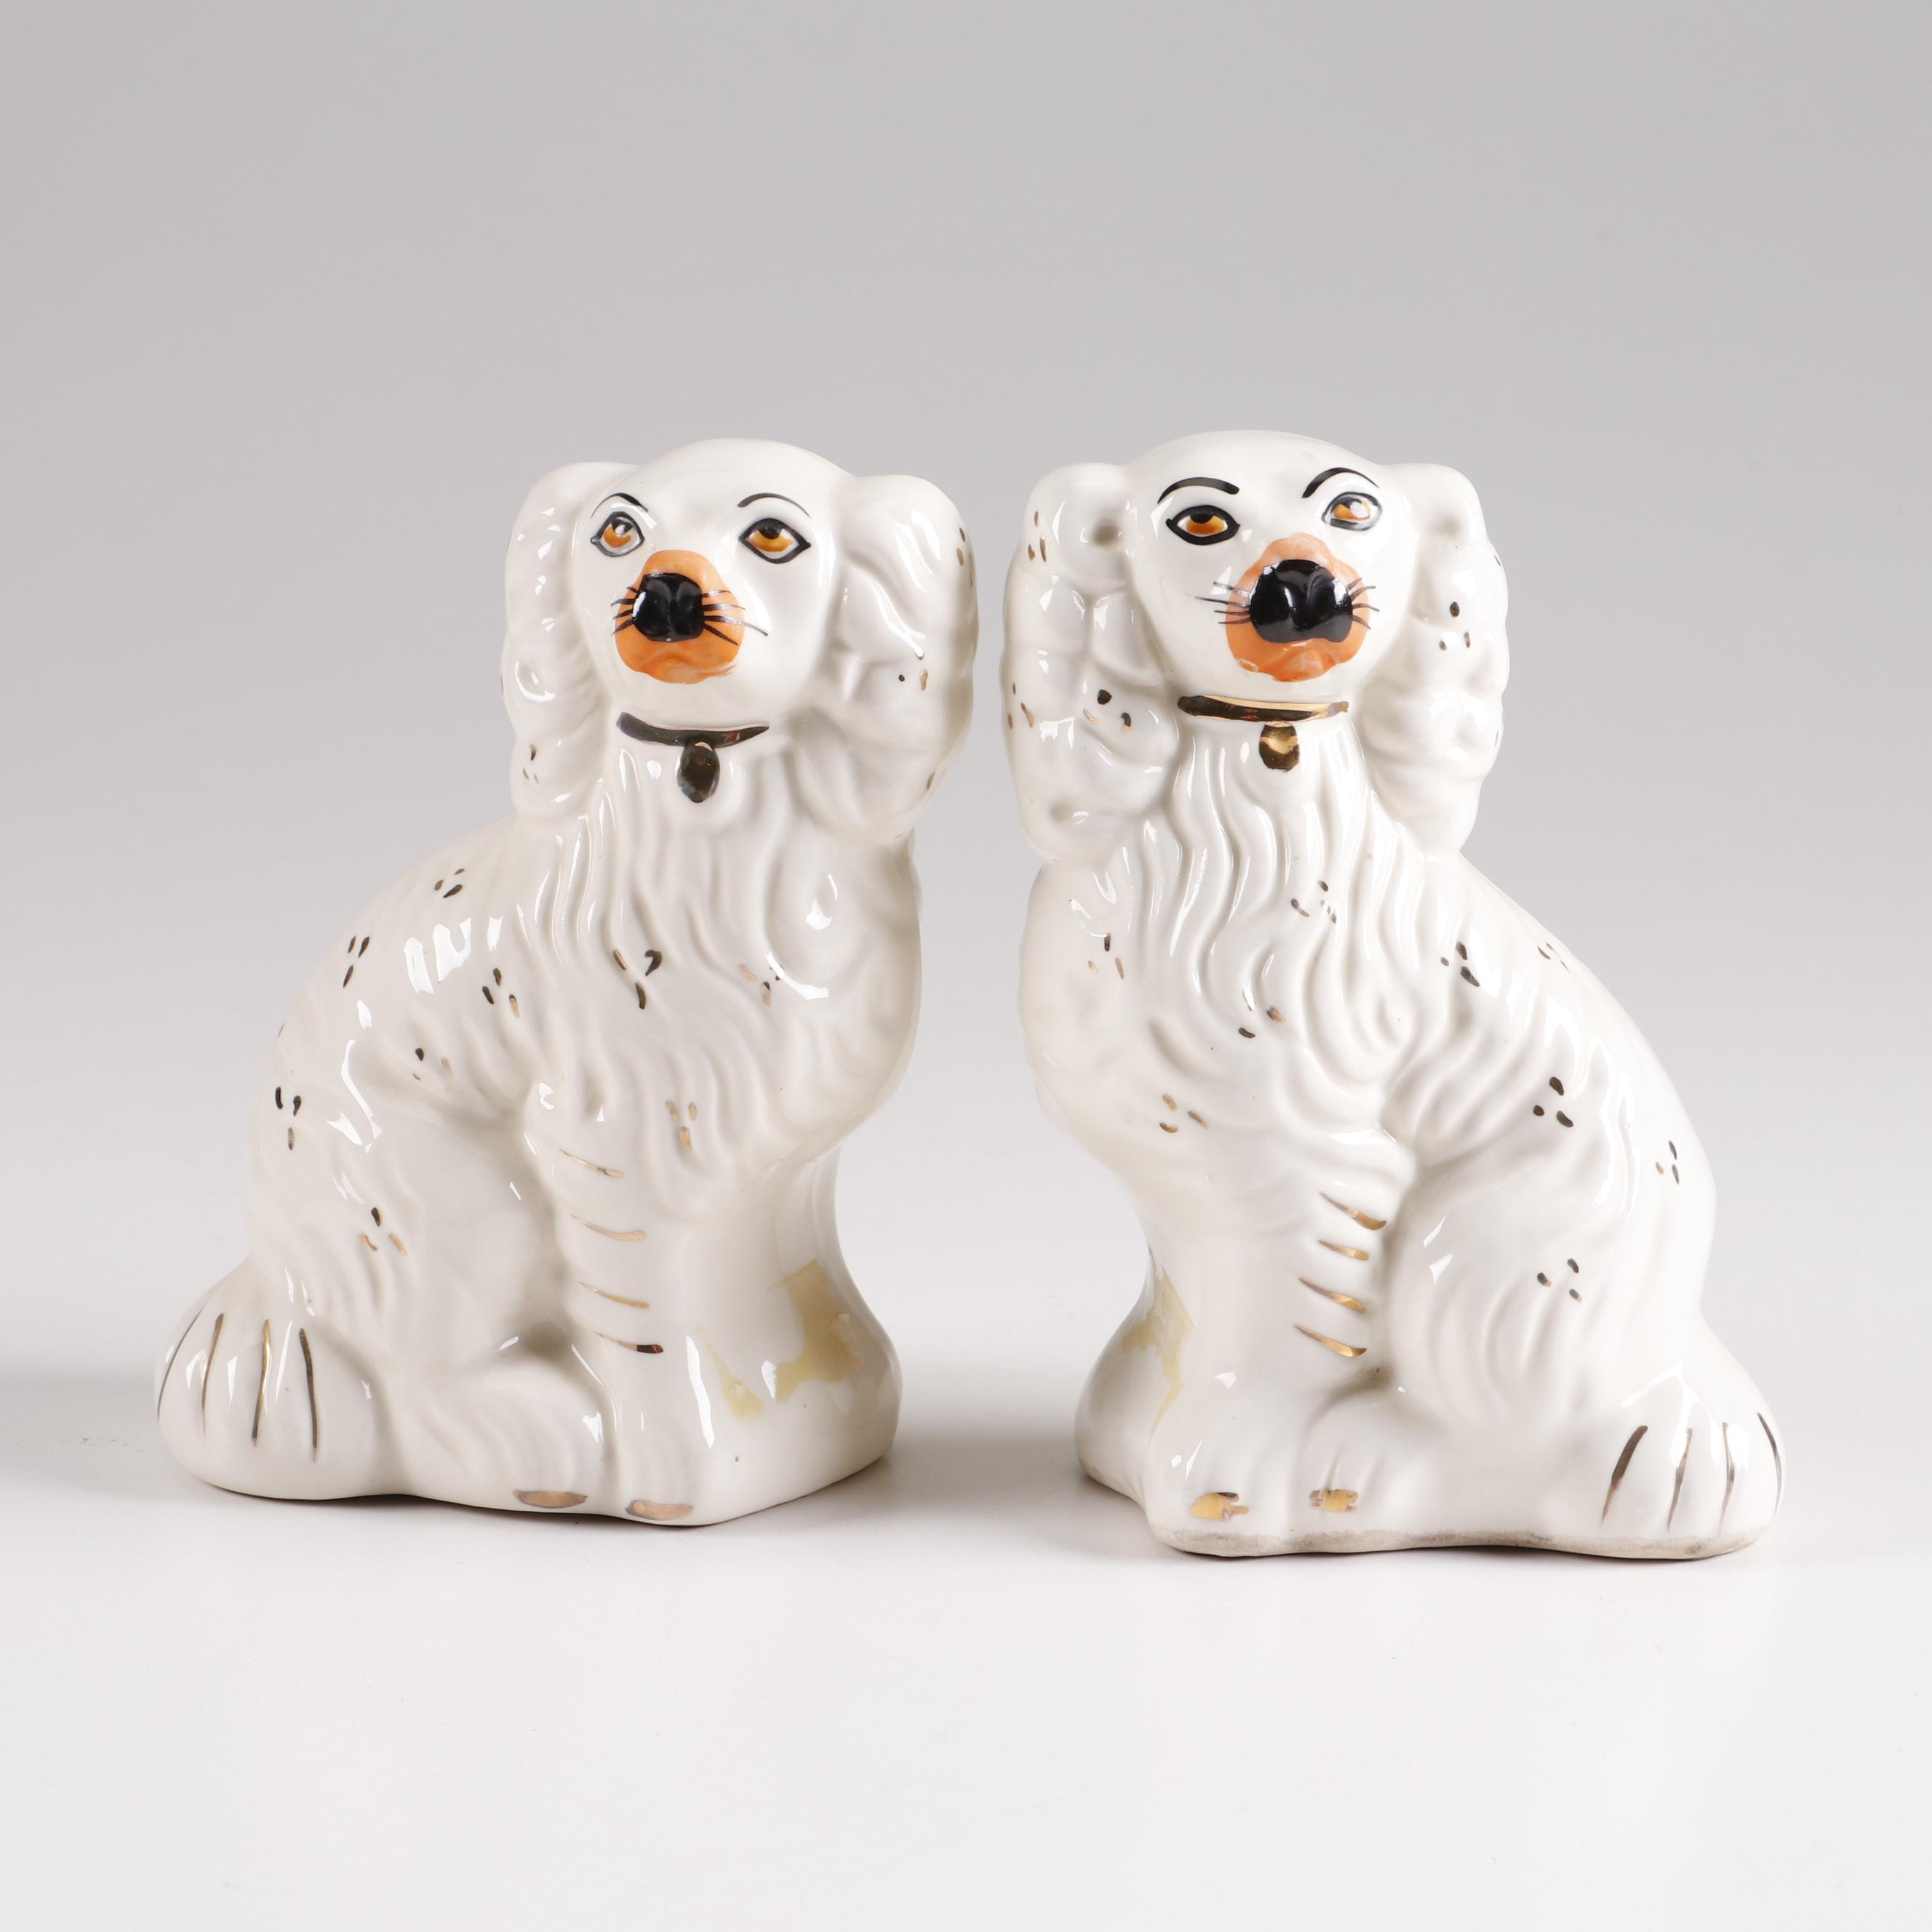 Staffordshire Style Porcelain Dog Figurines, 20th Century